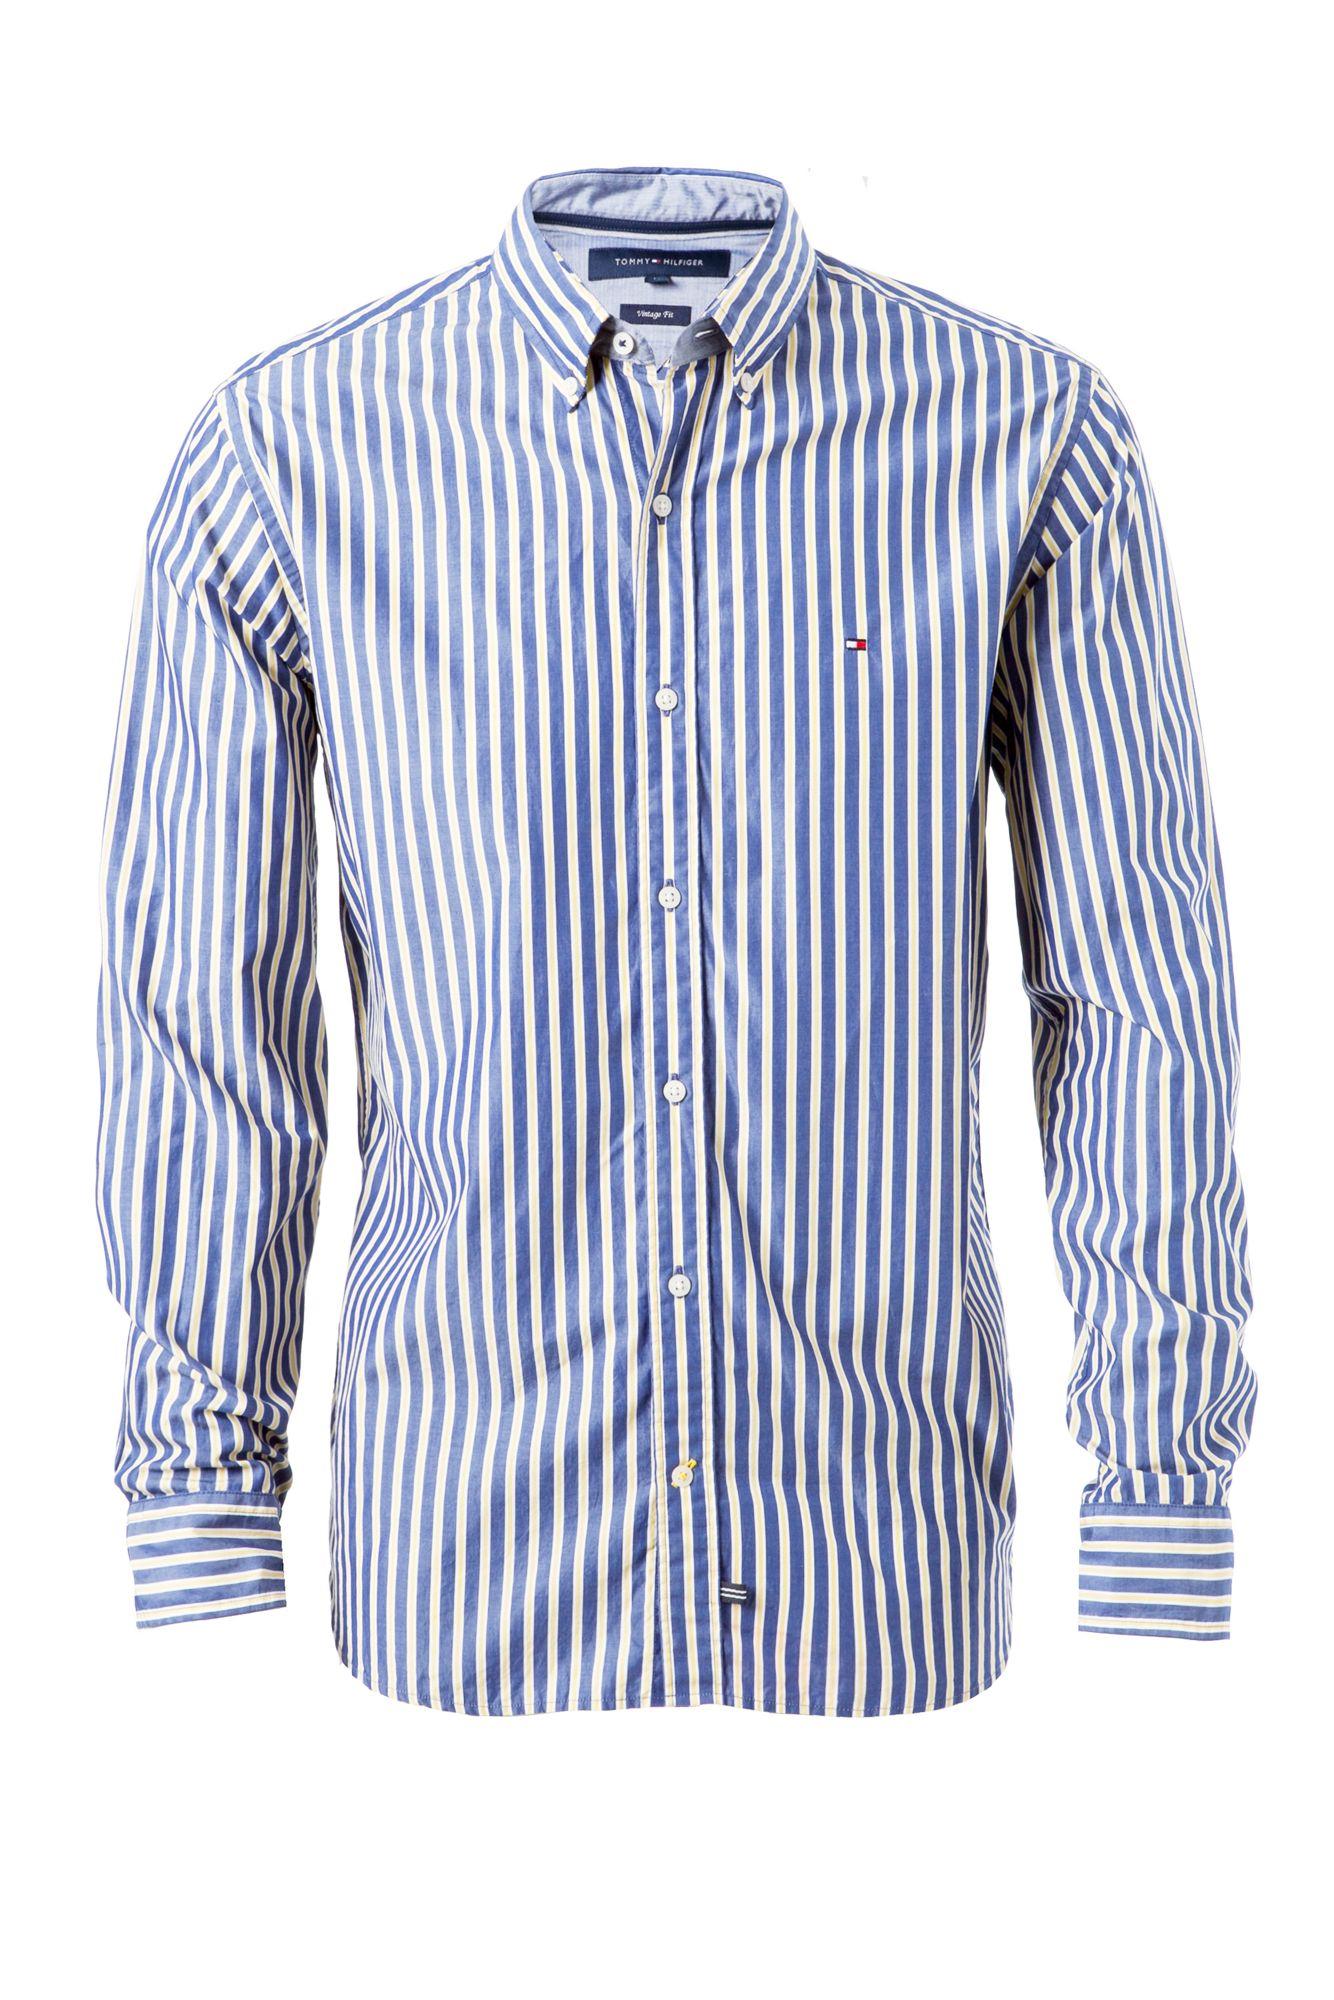 Tommy hilfiger charles stripe shirt in blue for men lyst for Tommy hilfiger fitzgerald striped shirt